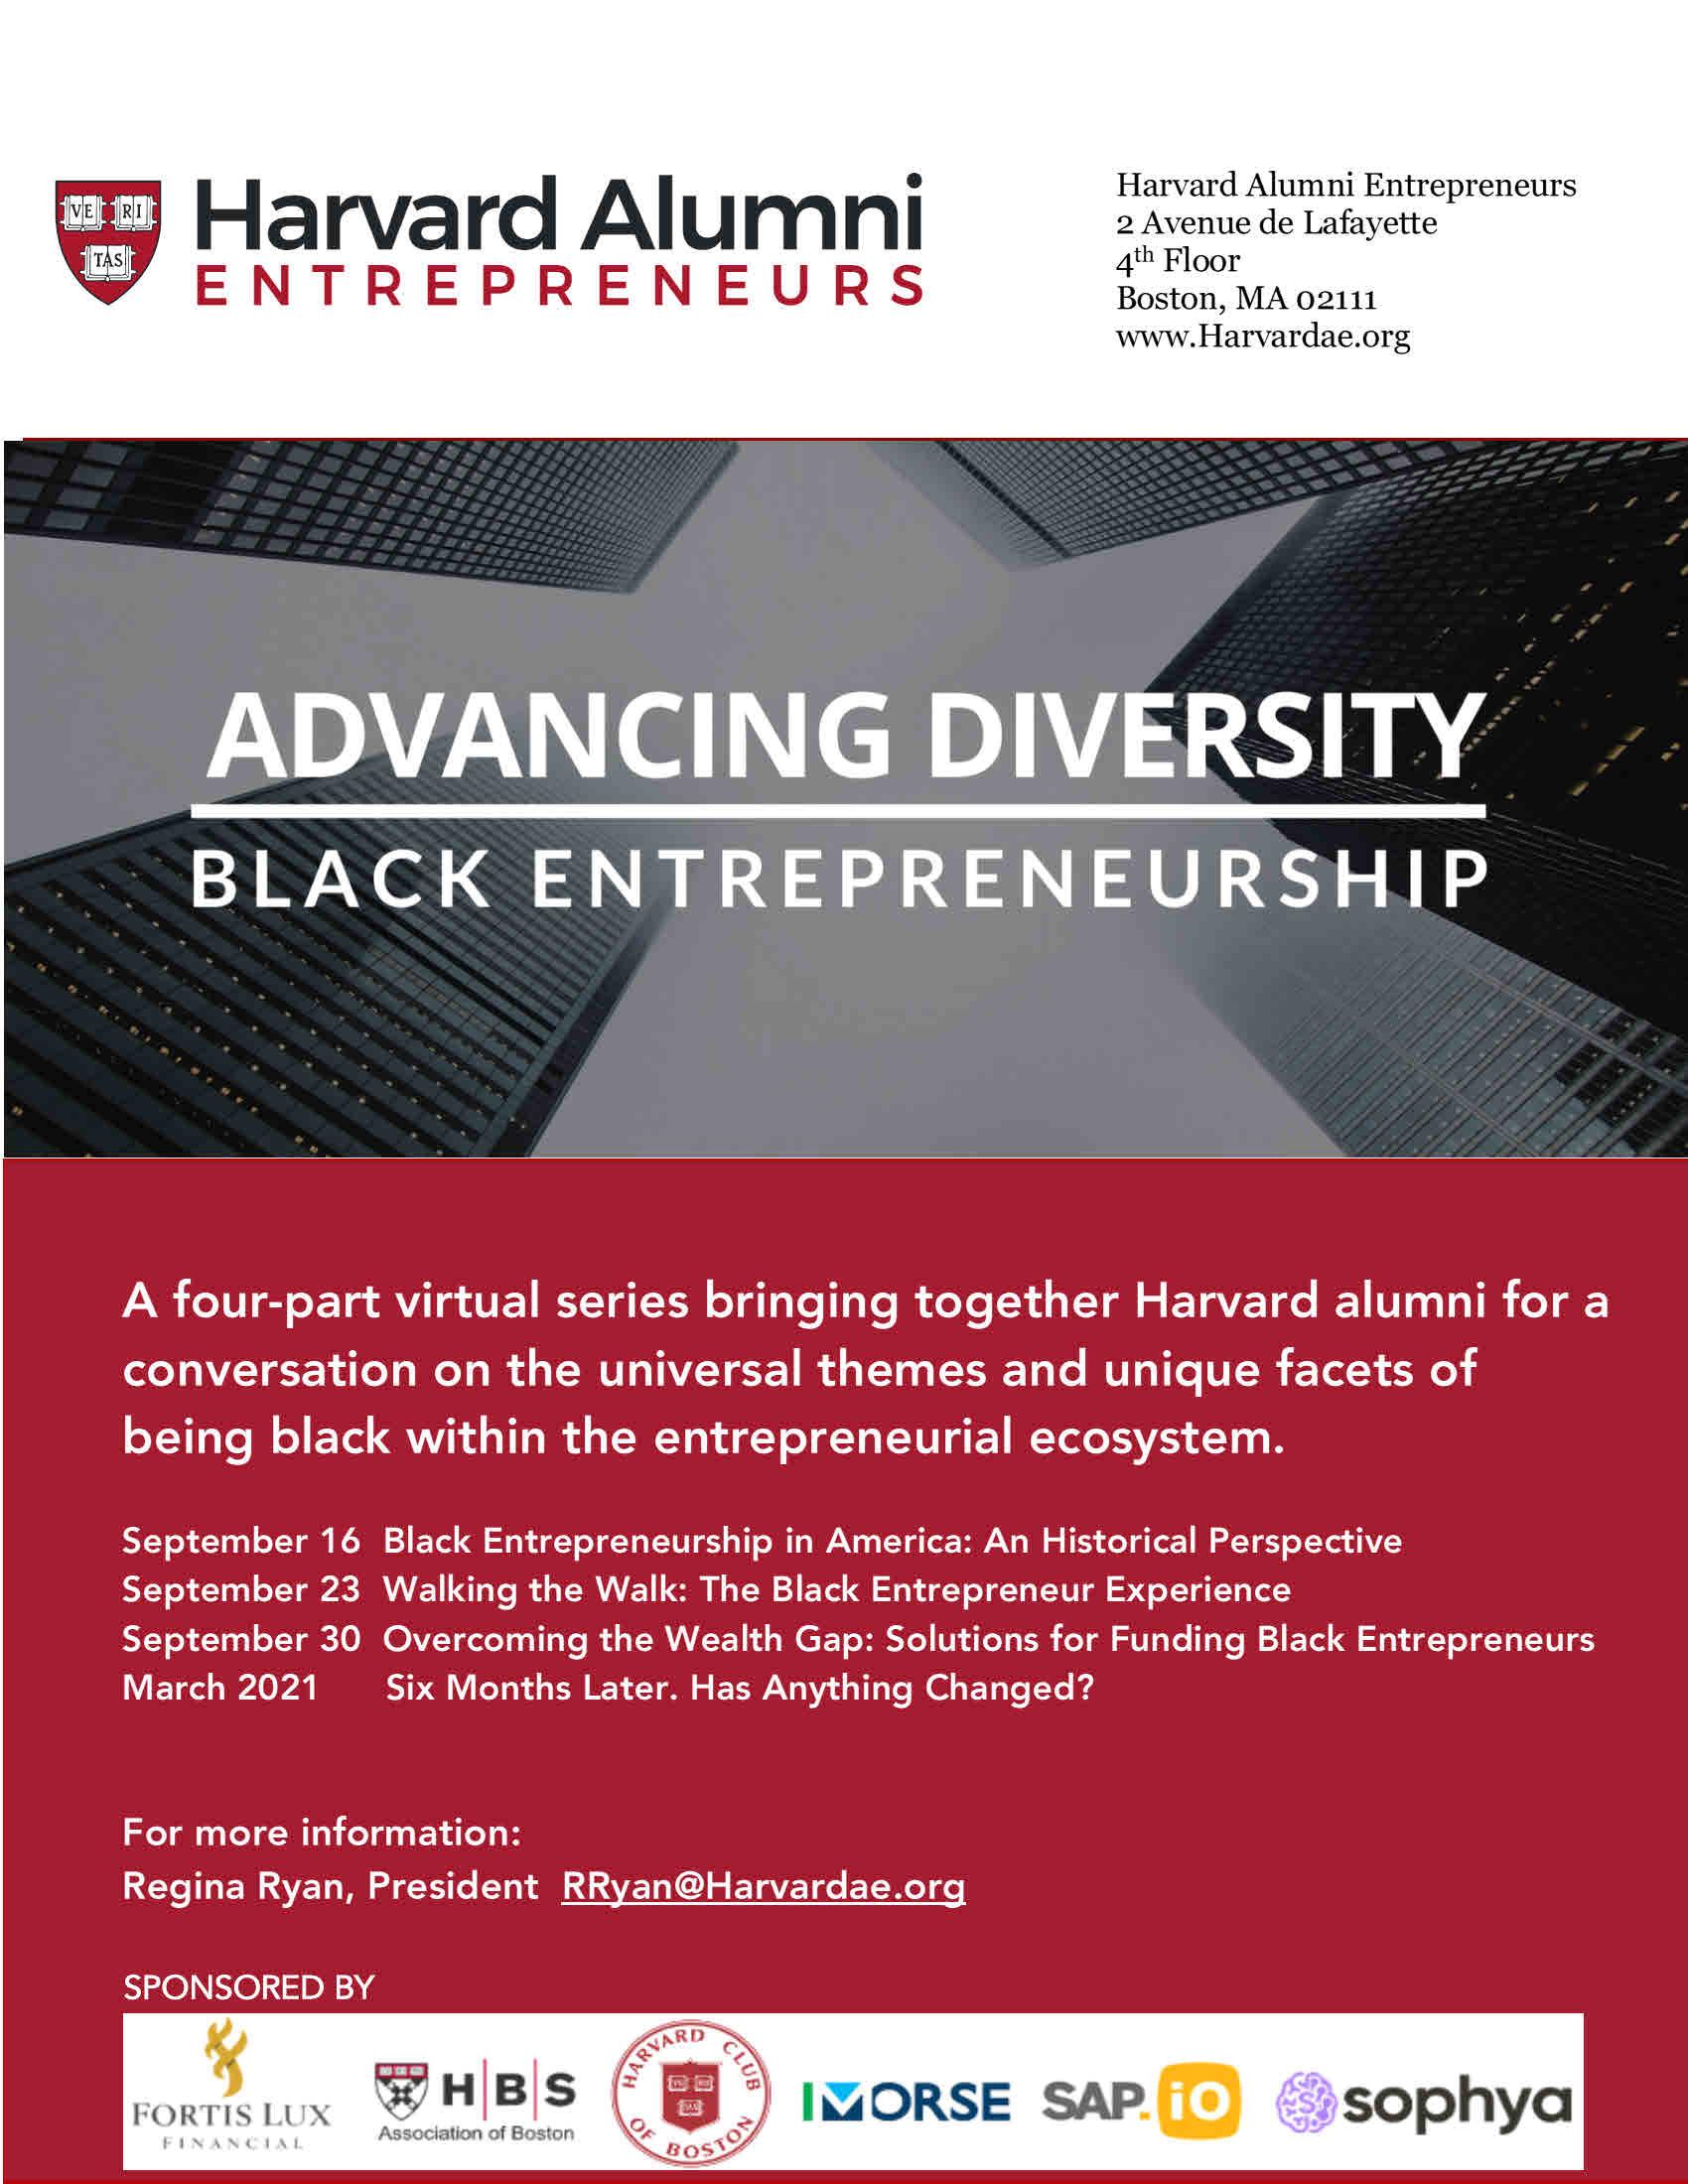 hae-advancing-diversity_overview_september-2020